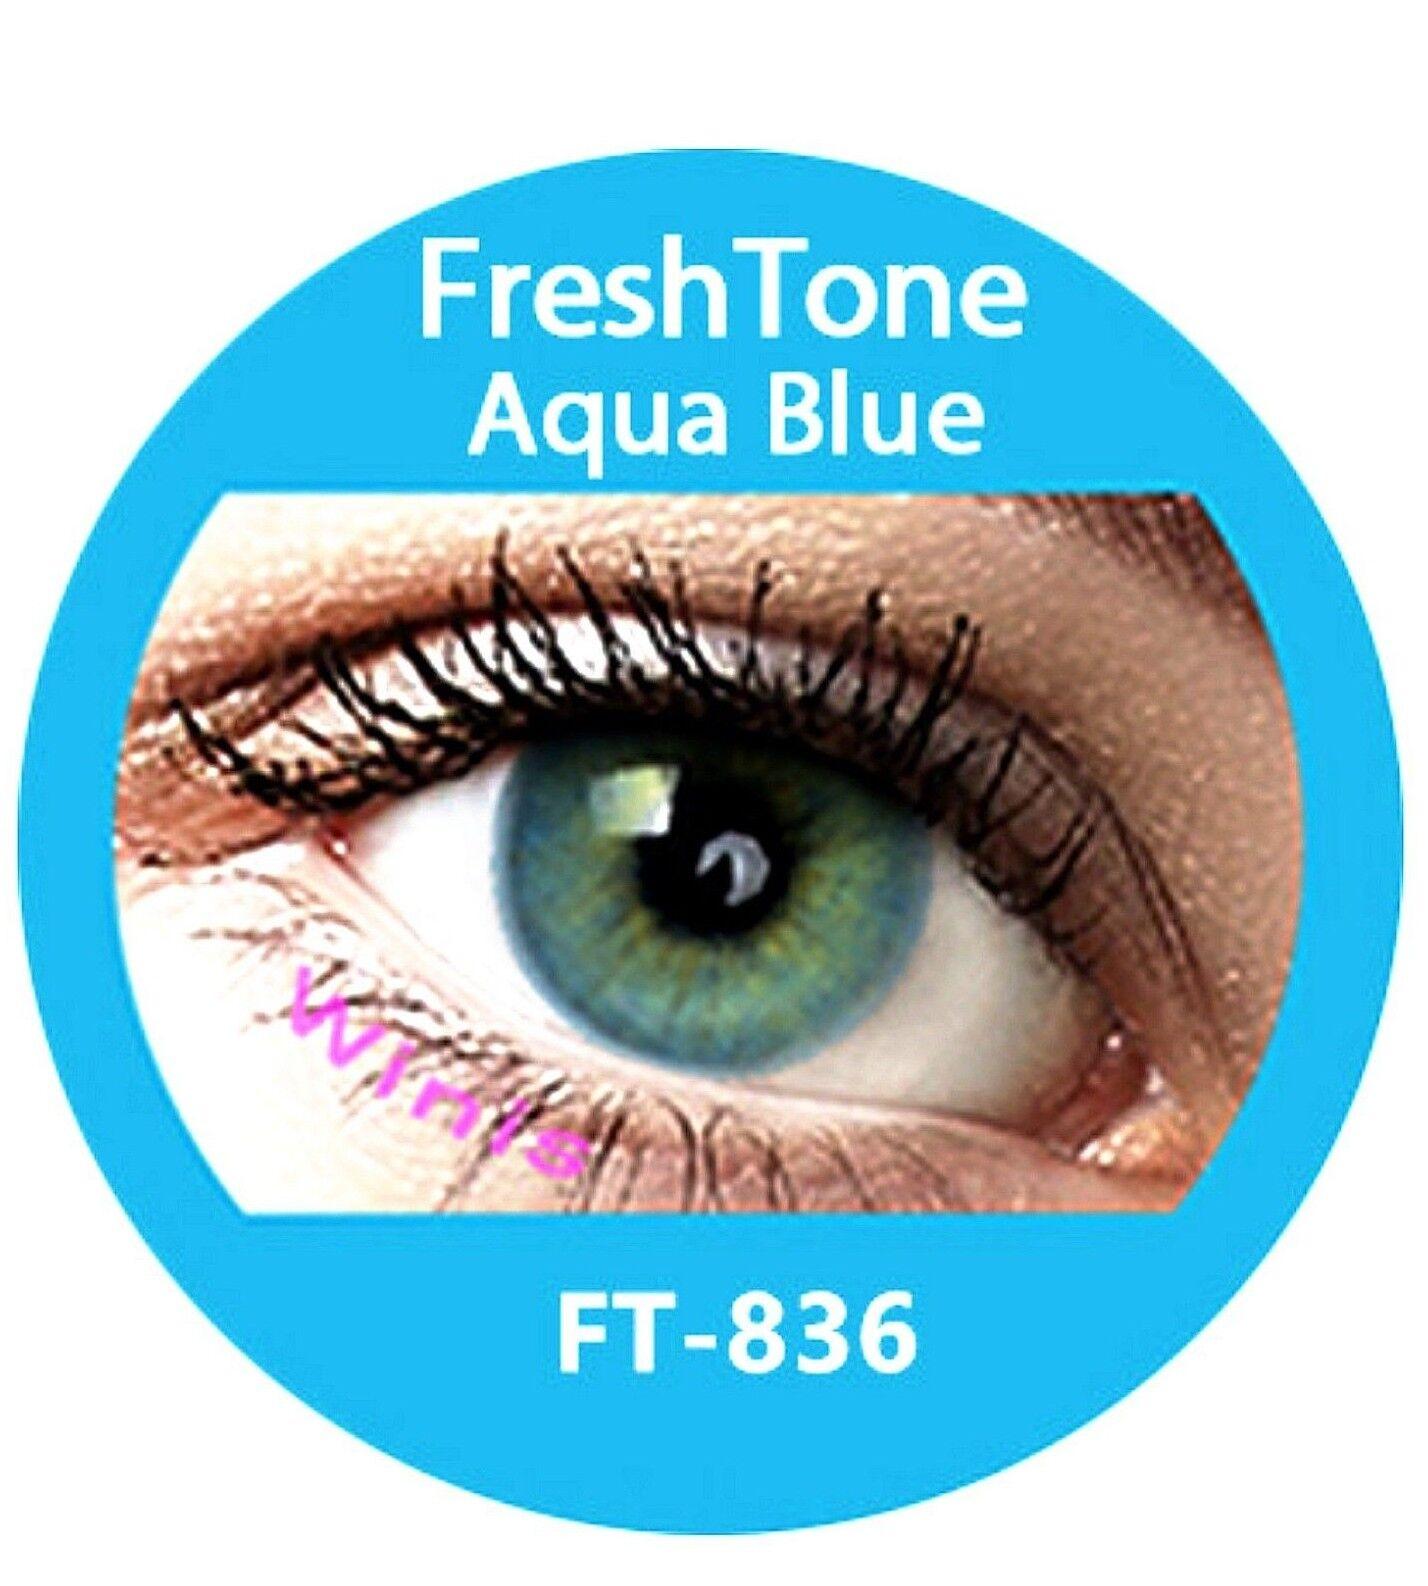 Freshtone Supernaturals Aqua Blue farbige Kontaktlinsen 3 Monatslinsen blau grün